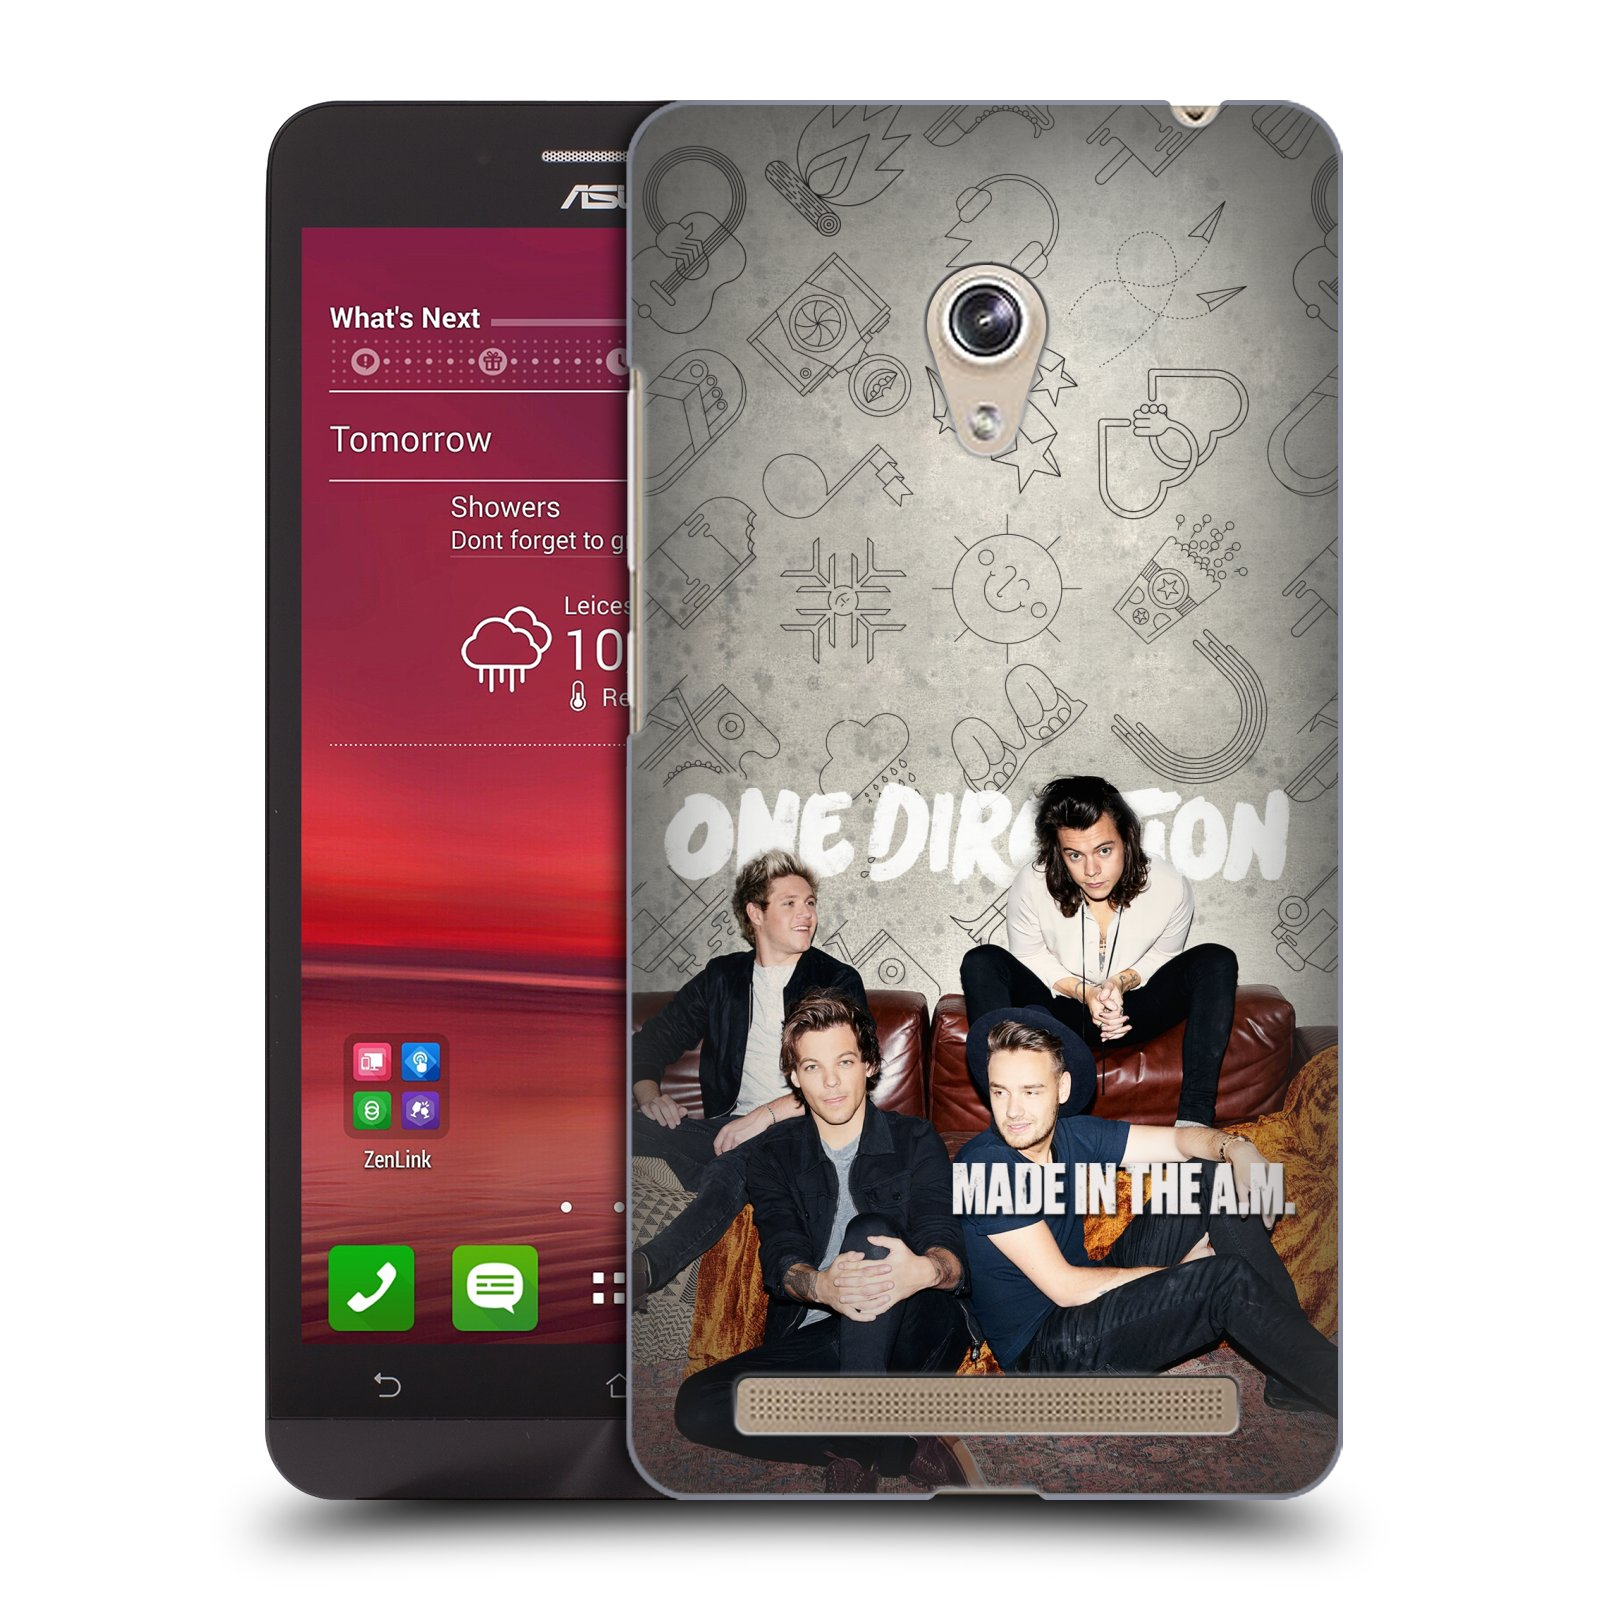 Plastové pouzdro na mobil Asus Zenfone 6 HEAD CASE One Direction - Na Gaučíku (Kryt či obal One Direction Official na mobilní telefon Asus Zenfone 6 A600CG / A601CG)